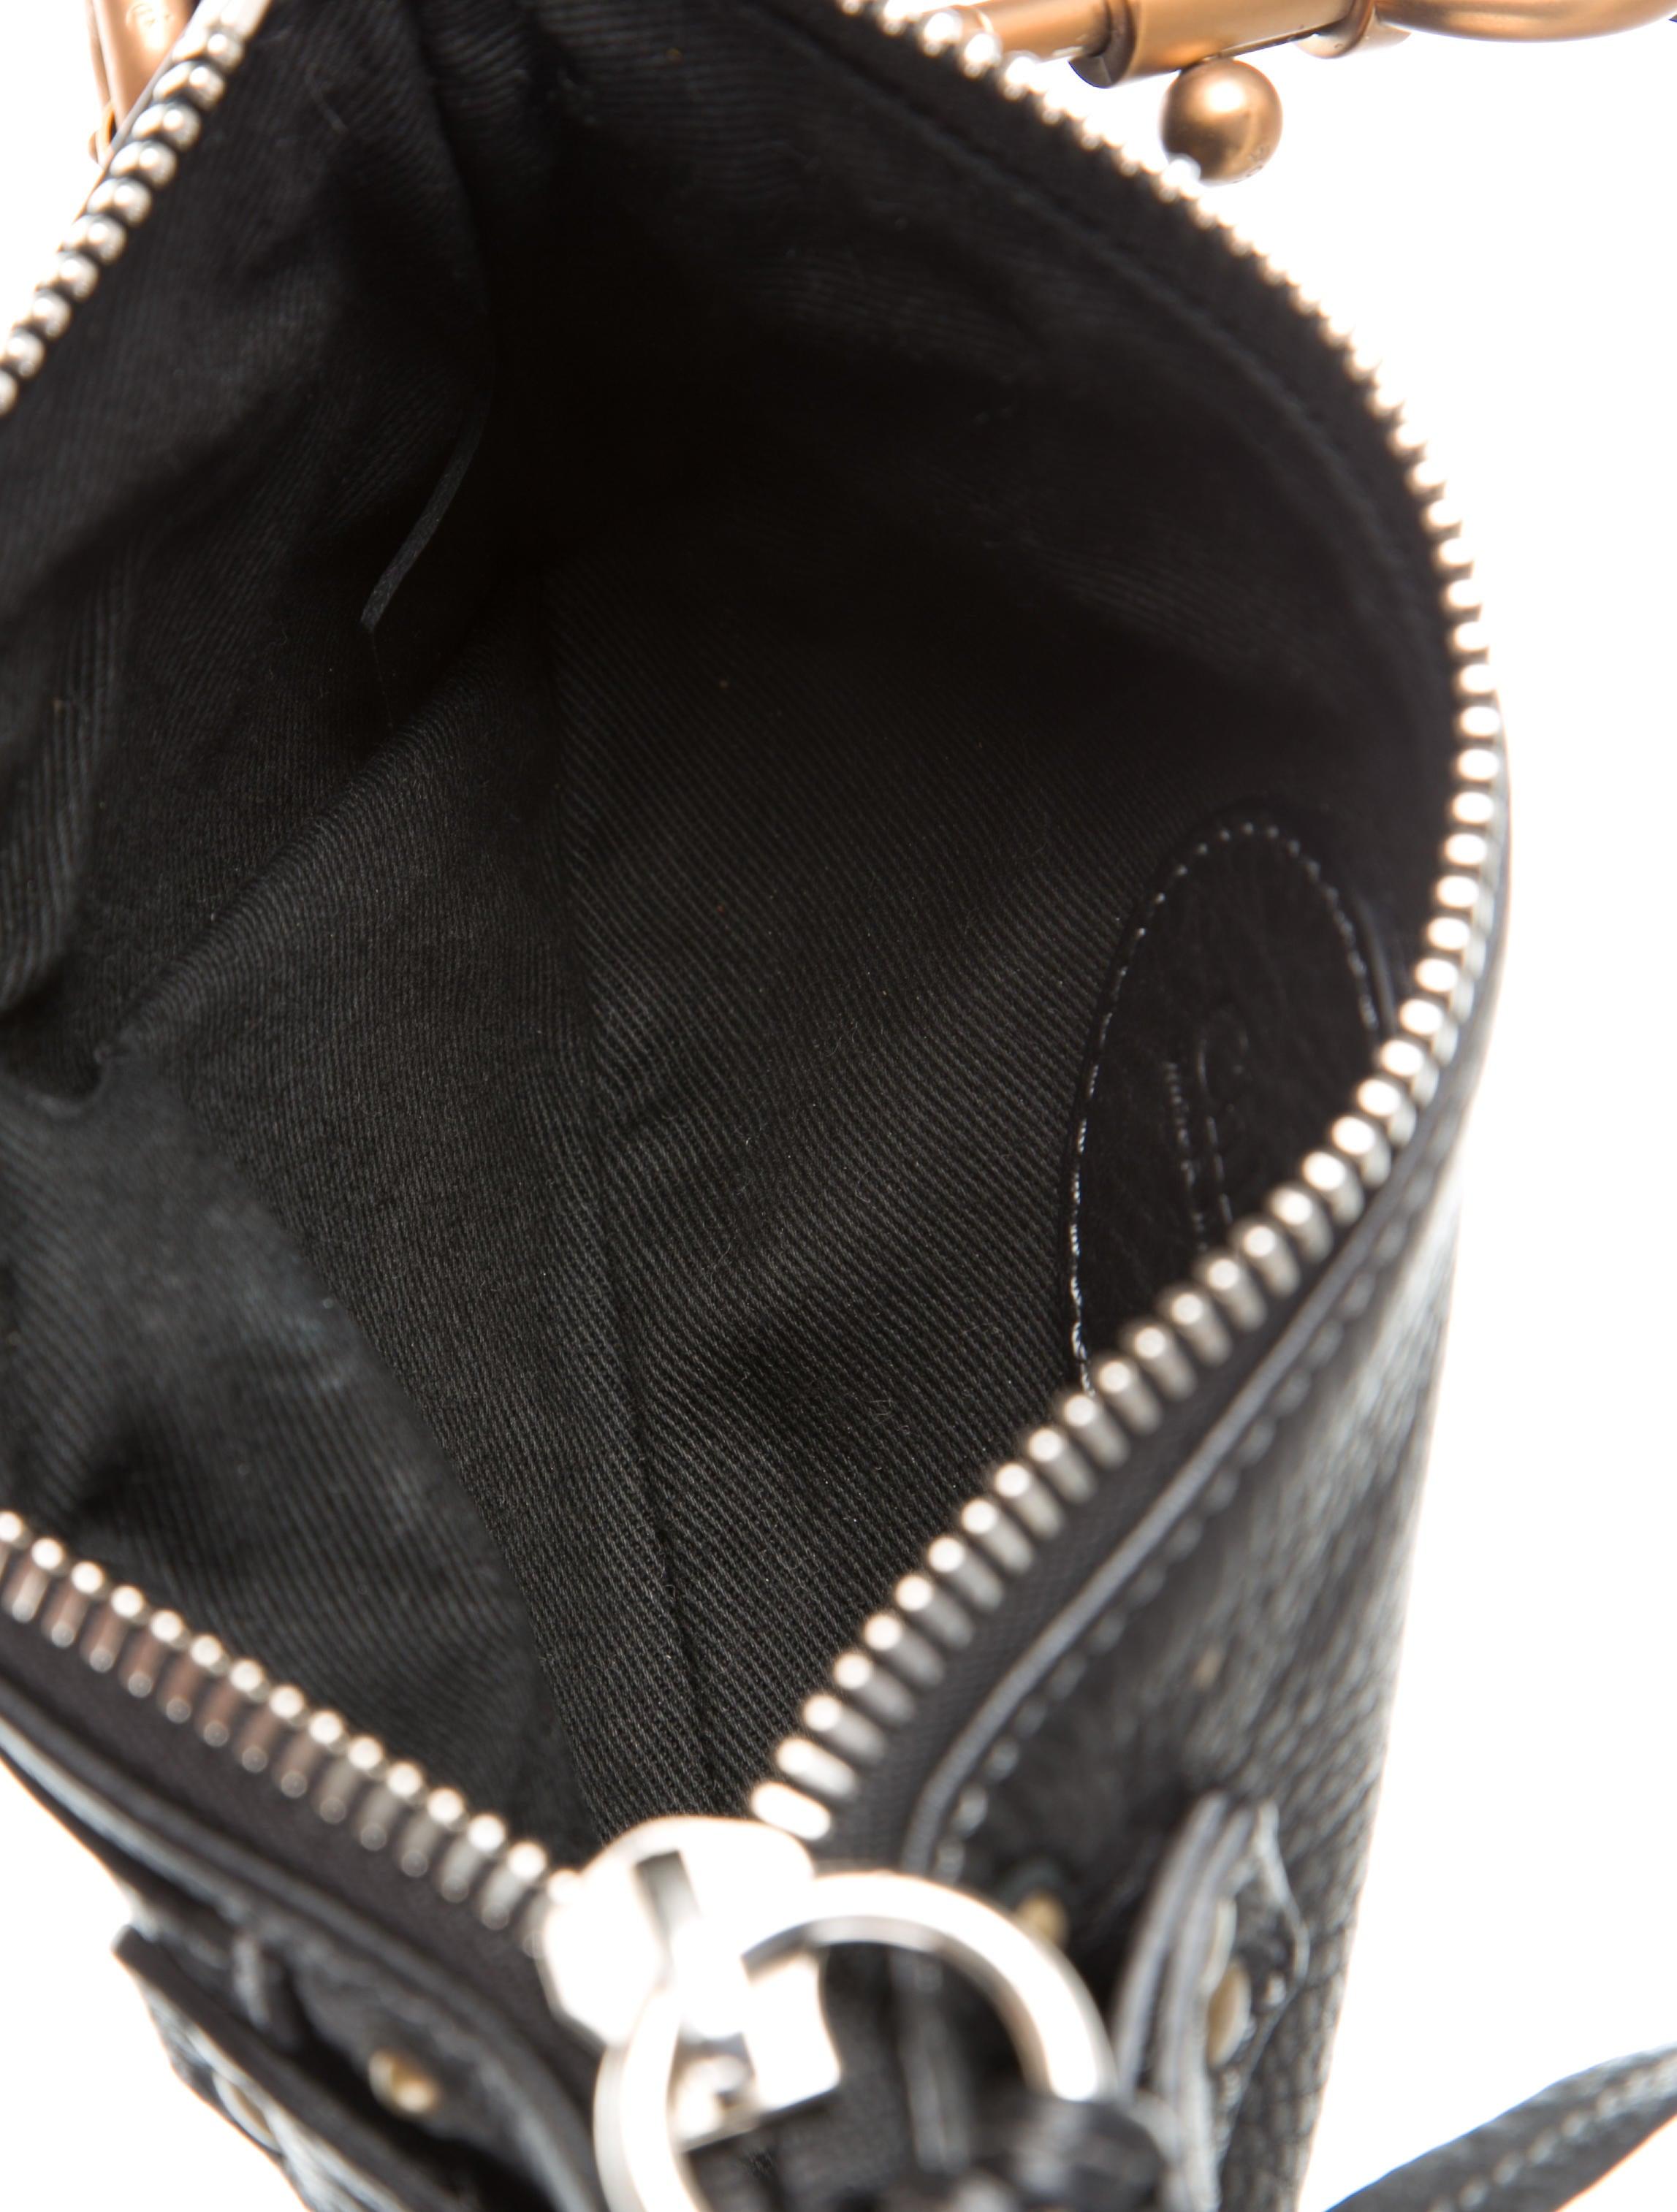 chloe replica purses - Chlo�� Metallic Paddington Pochette - Handbags - CHL41281 | The ...